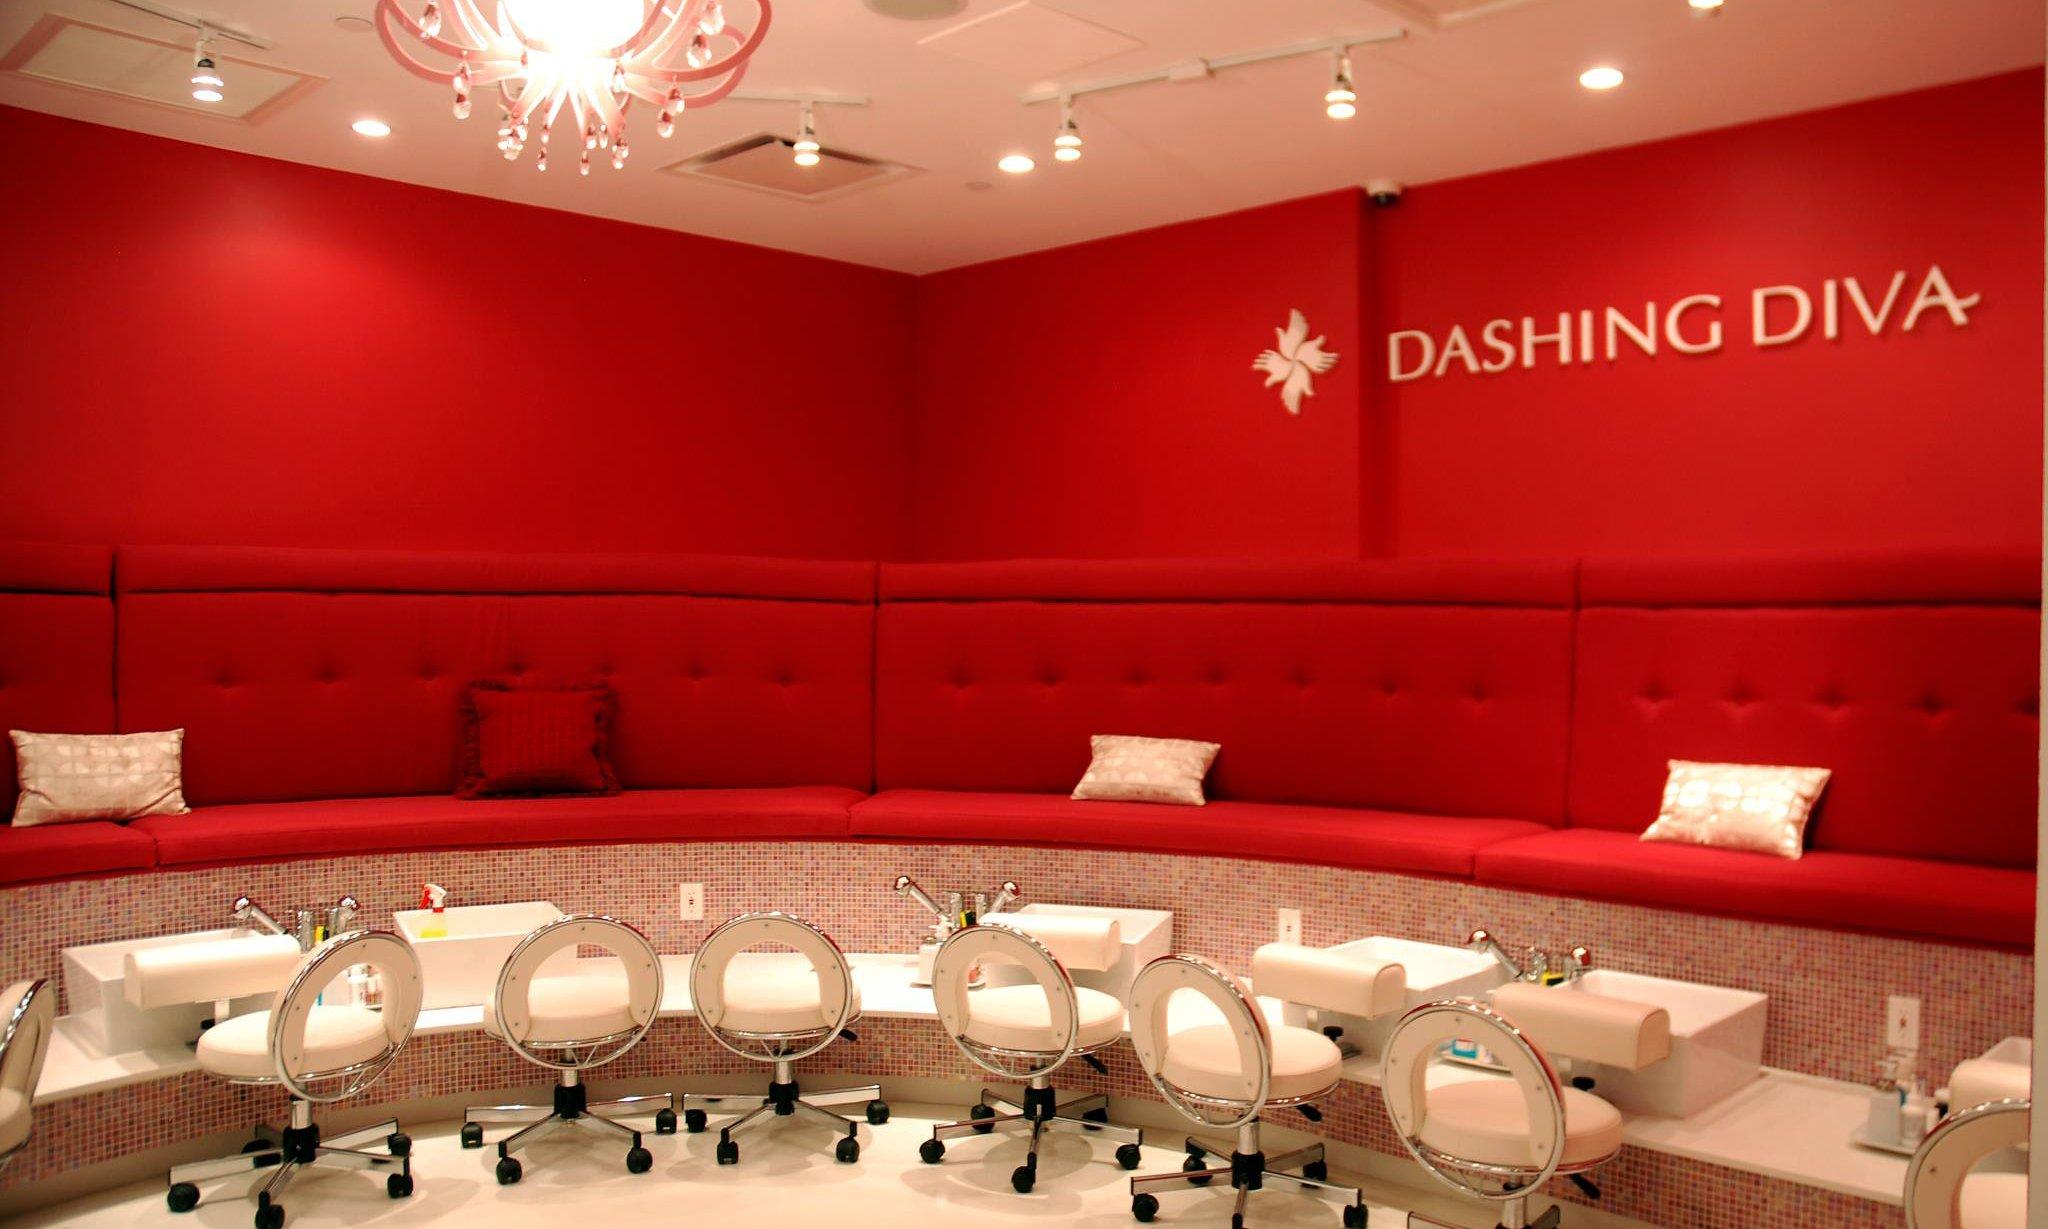 Dashing Diva  Nail Salon  New York City  Vogue